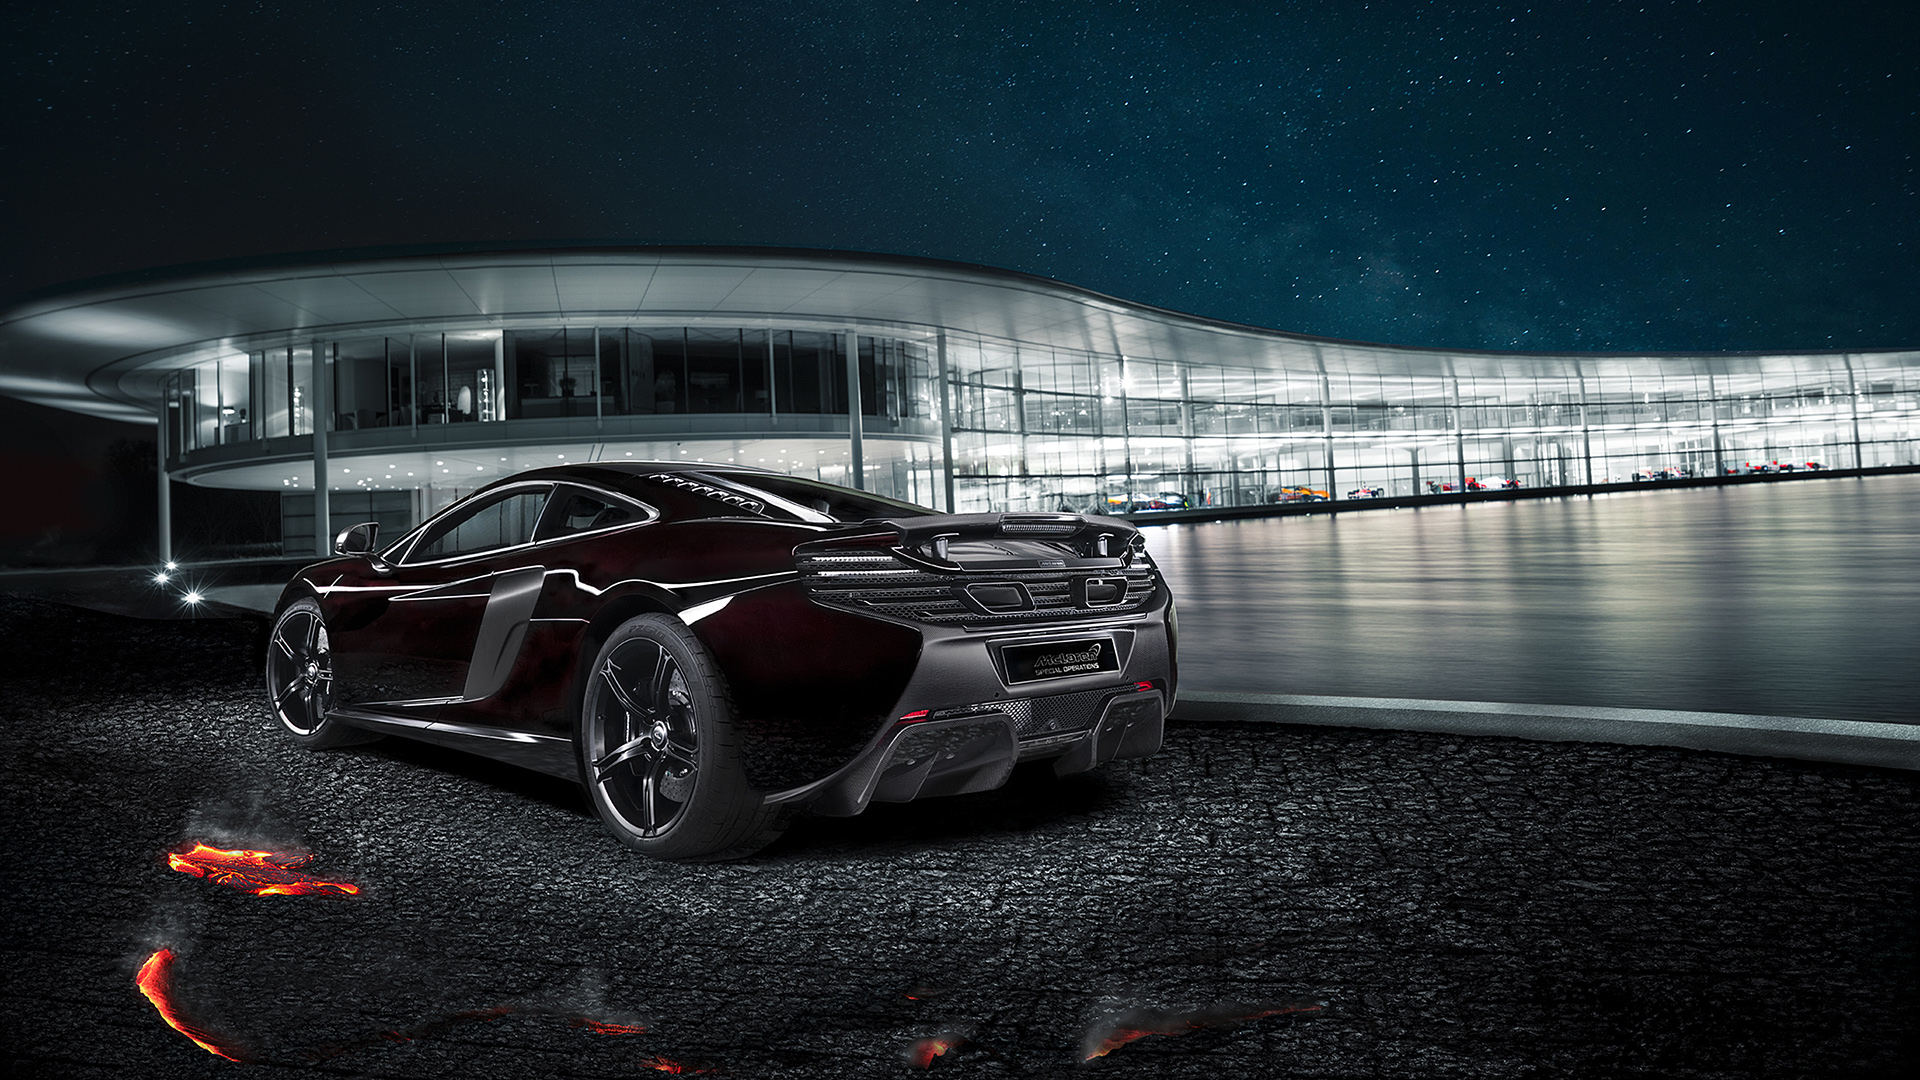 2014 McLaren 650S Coupe MSO Concept